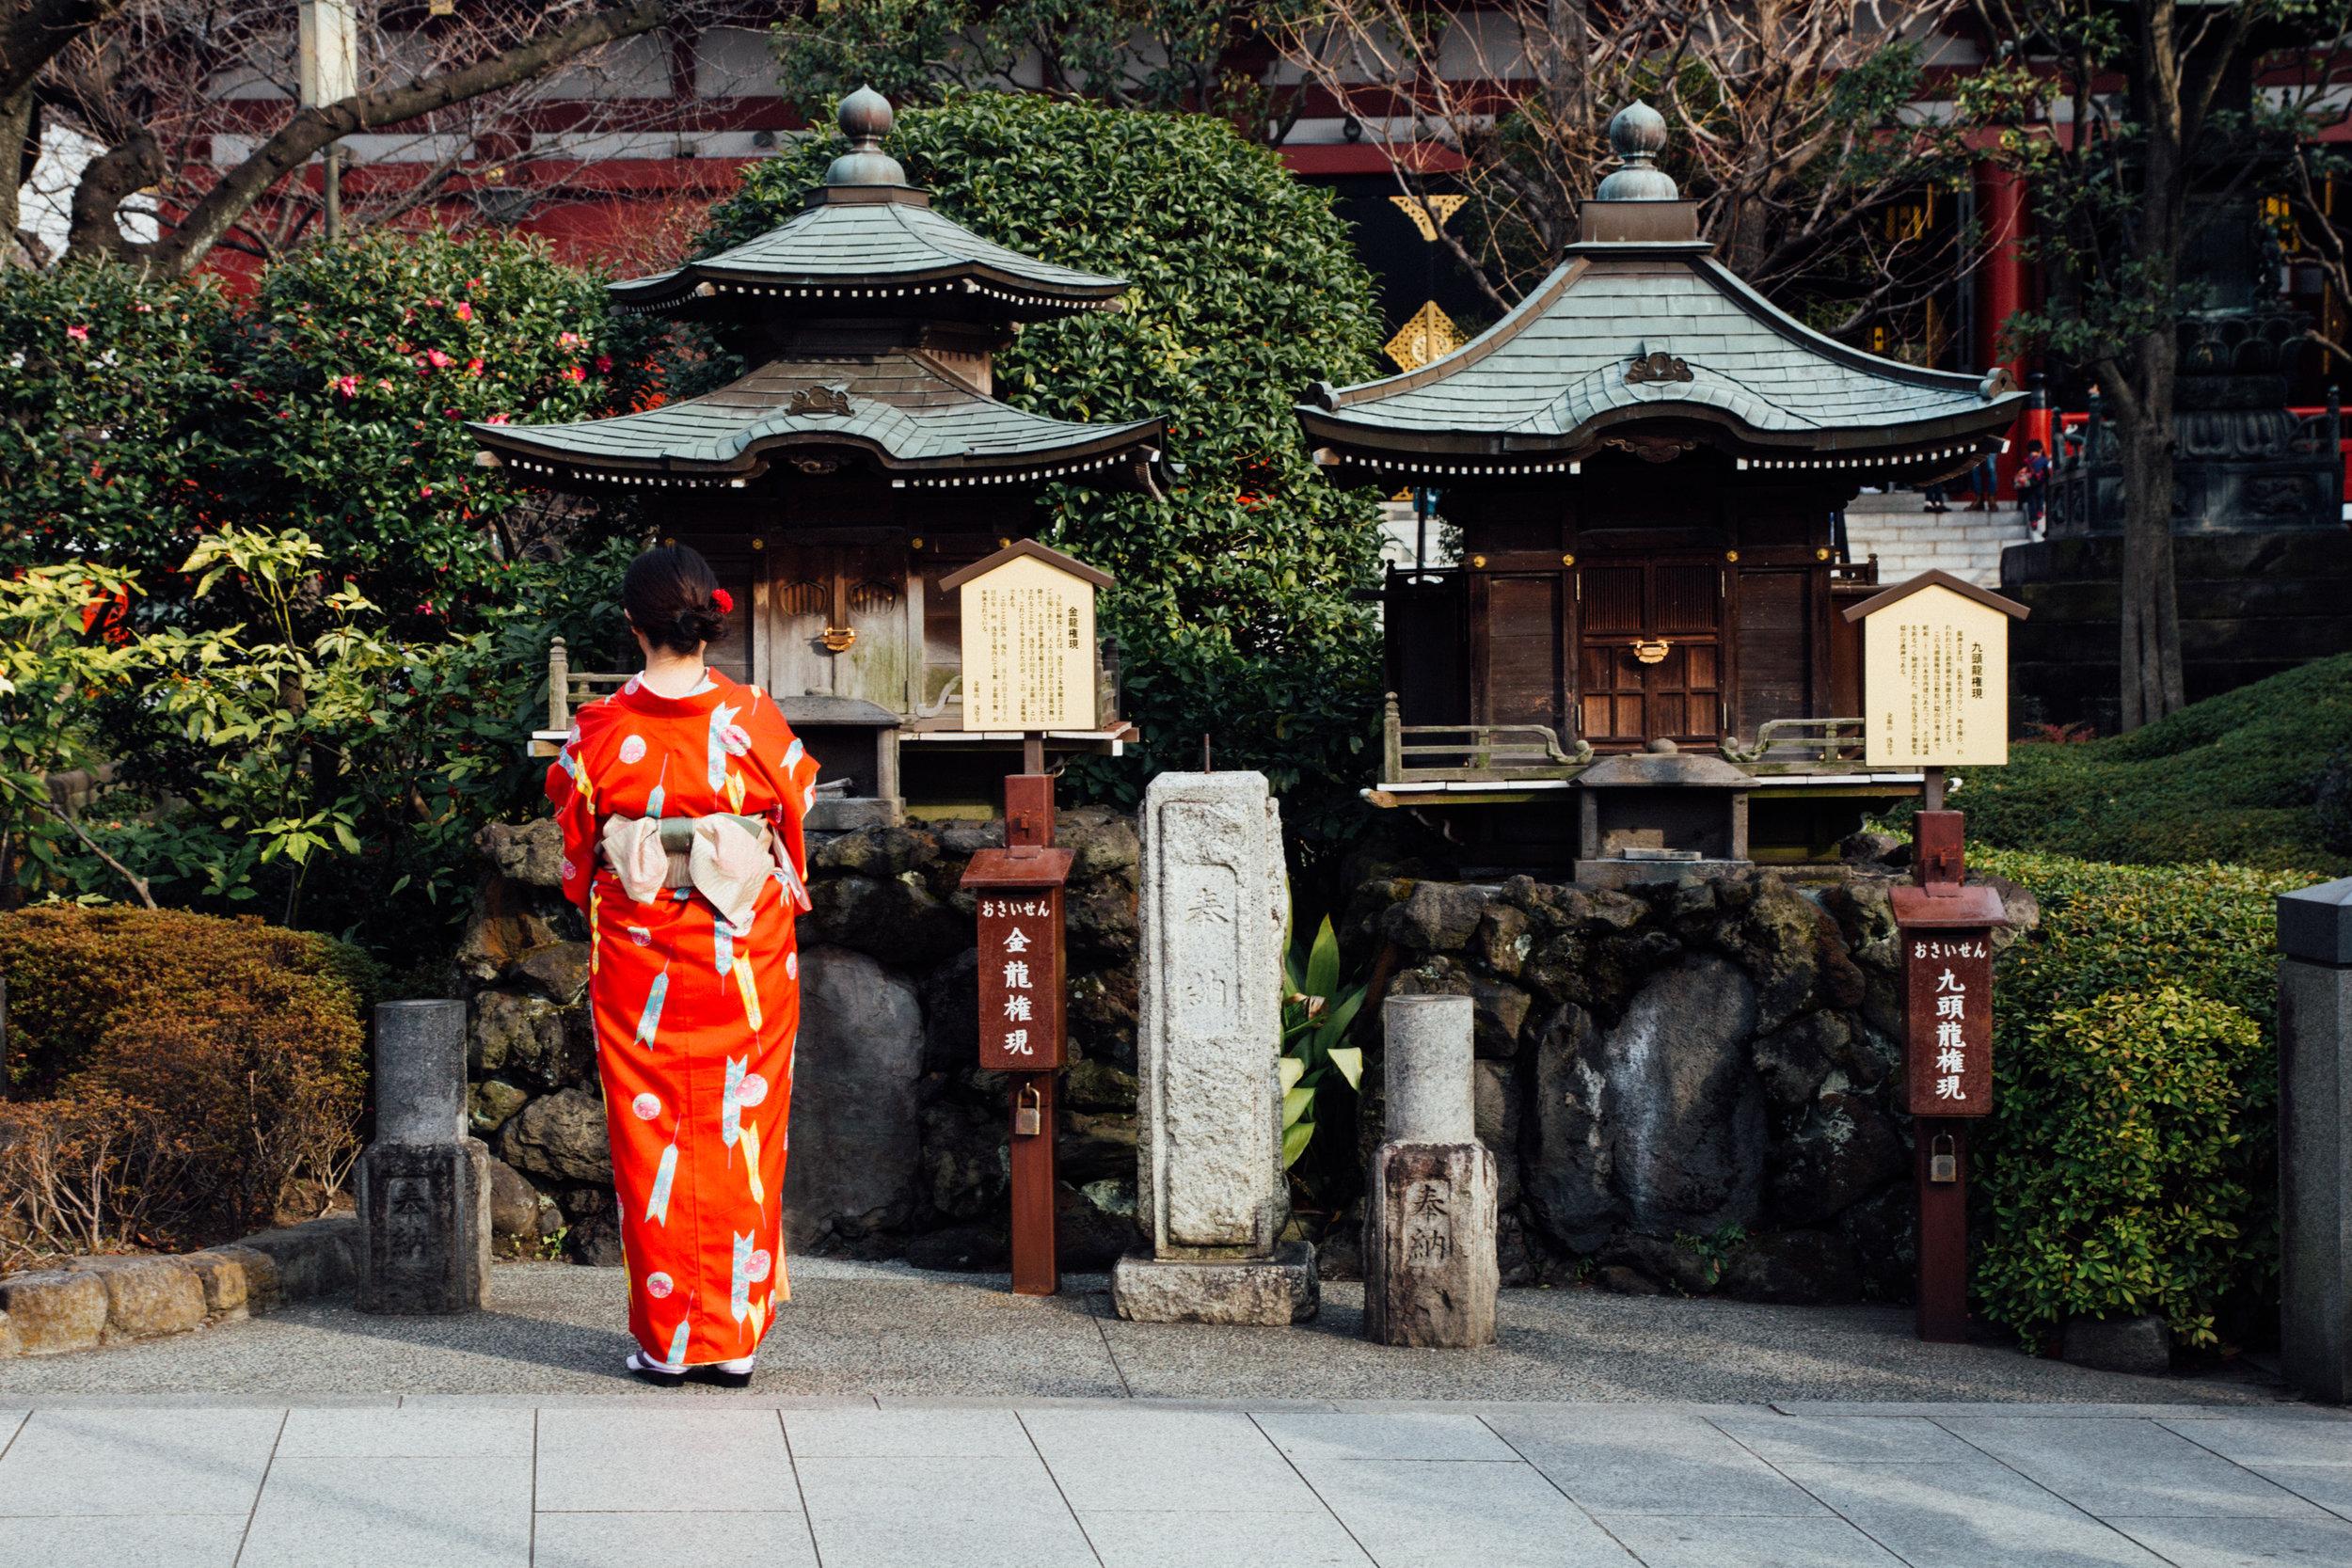 Travel JAPAN: Tokyo & Kyoto's Top Attractions